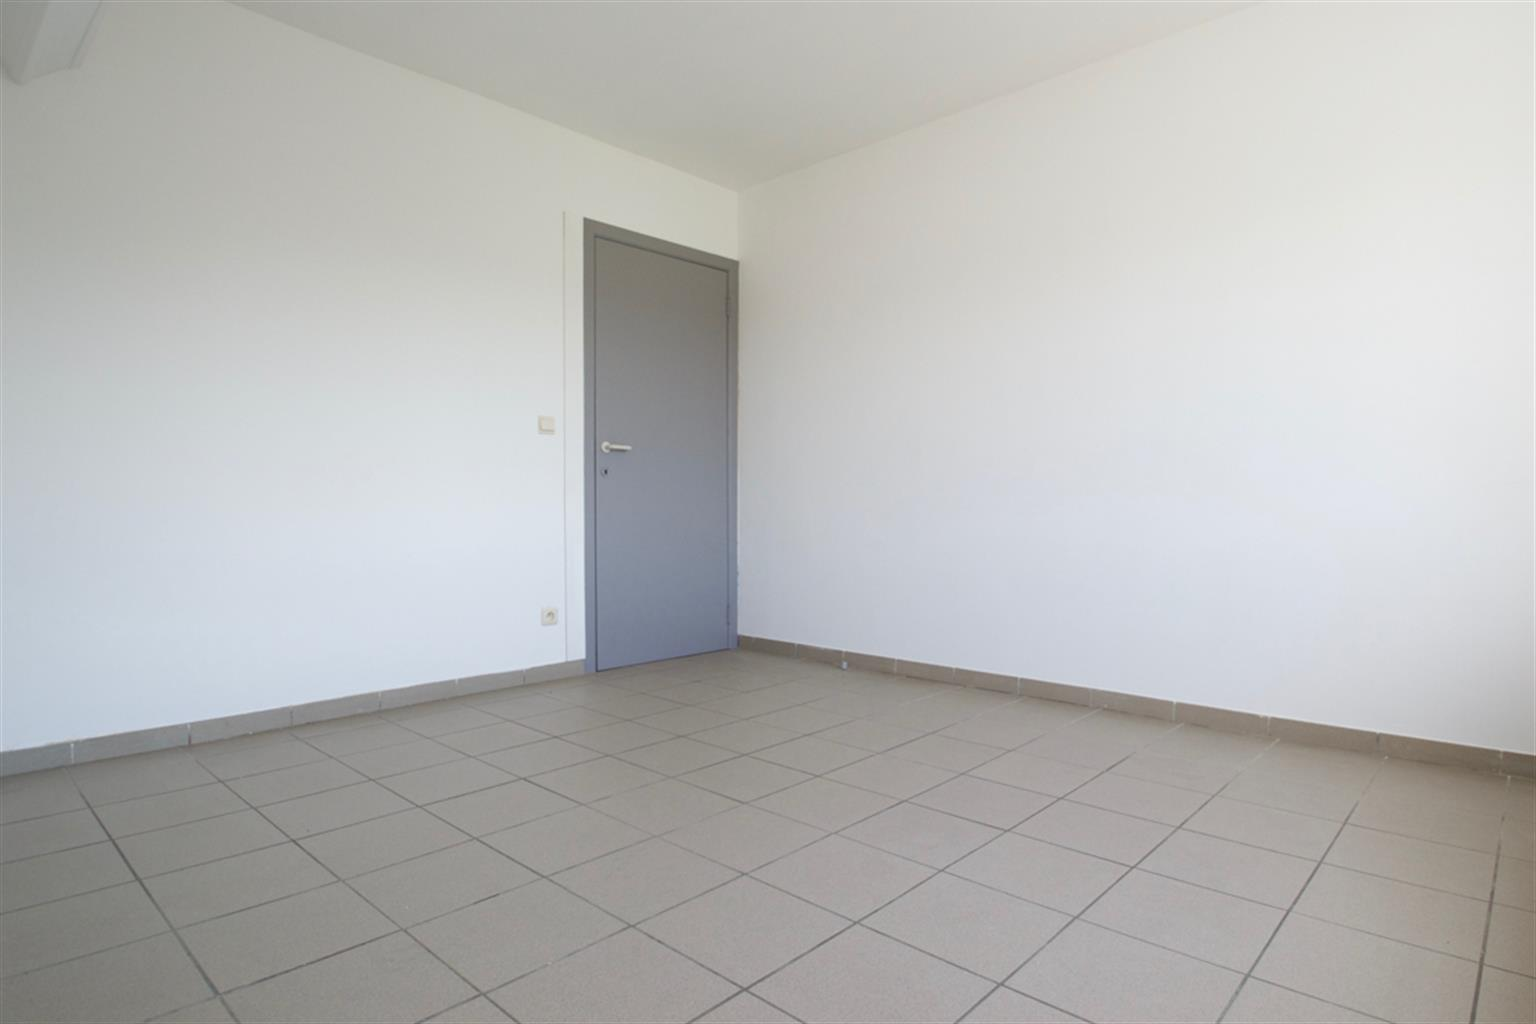 Appartement - Leval-Trahegnies - #3454438-3